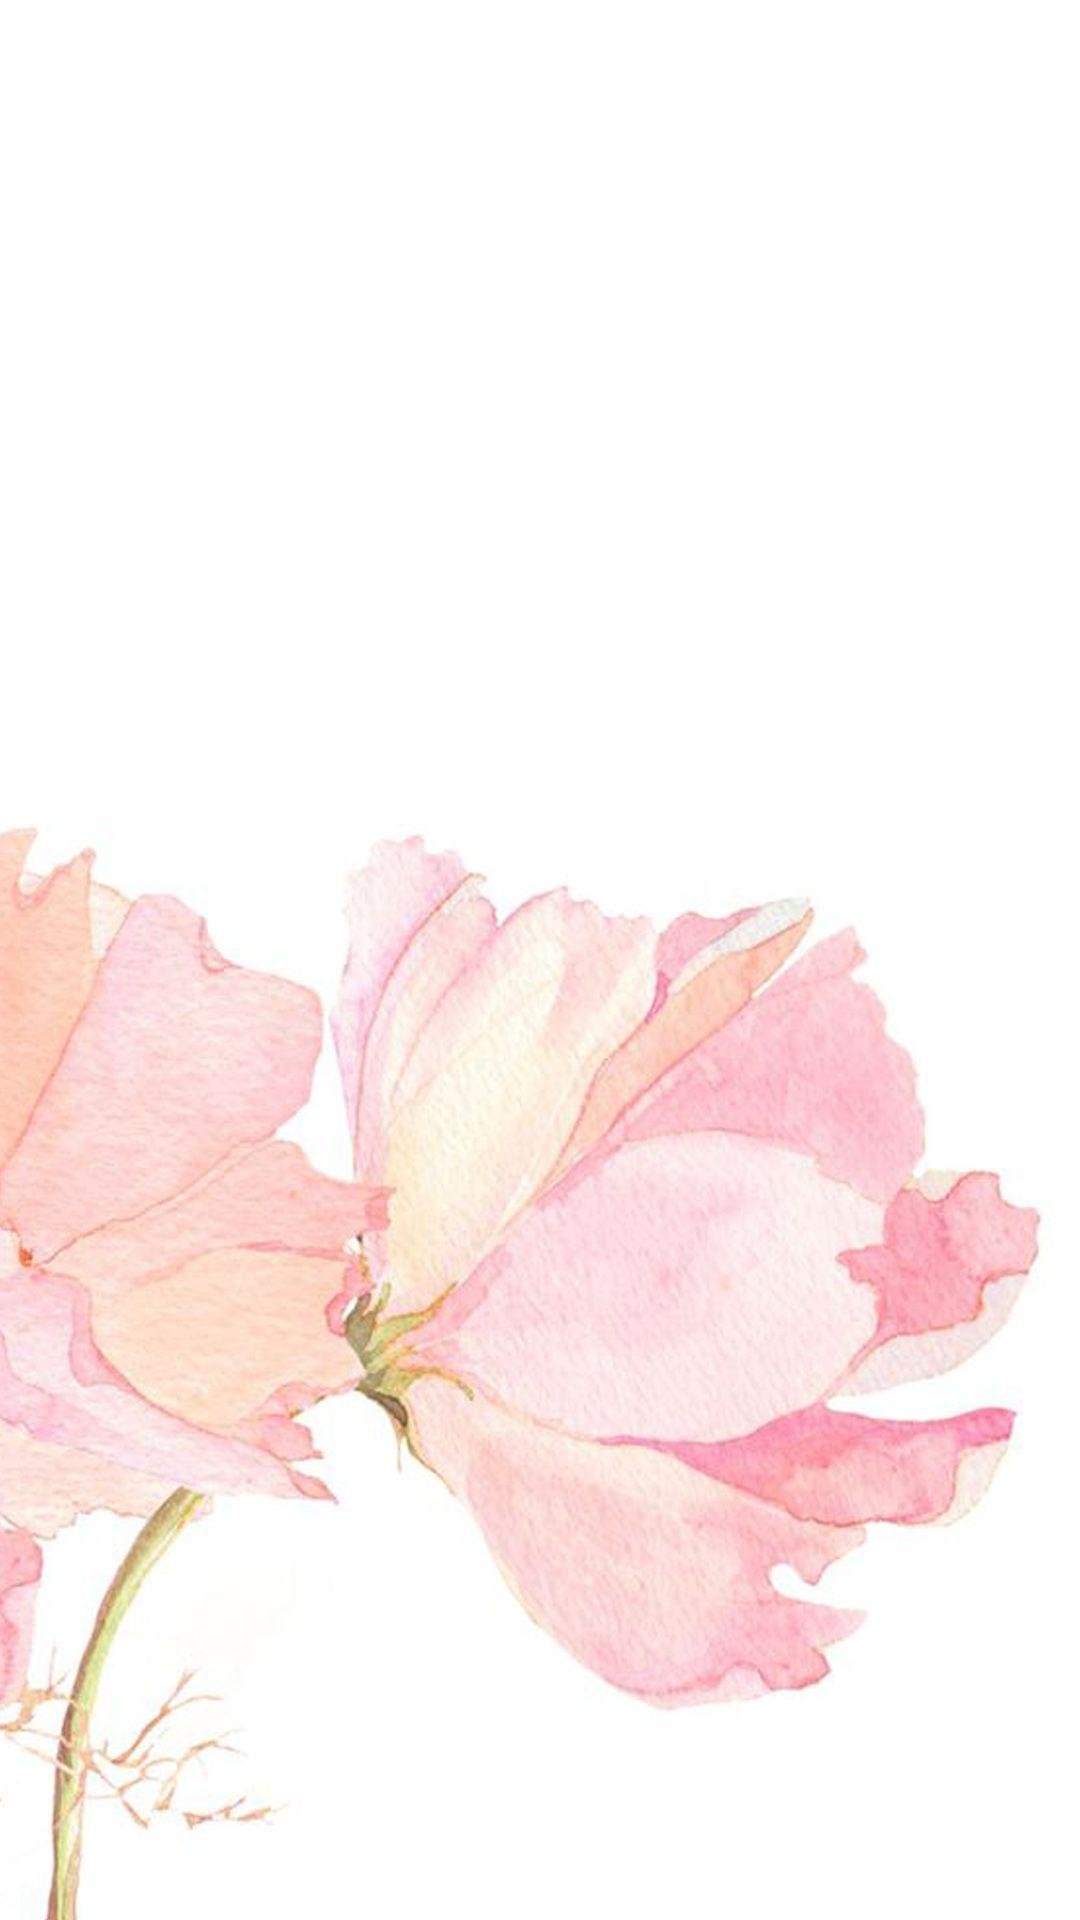 Iphone wallpaper tumblr flower - Nice Iphone 7 Wallpaperhd Tumblr 245